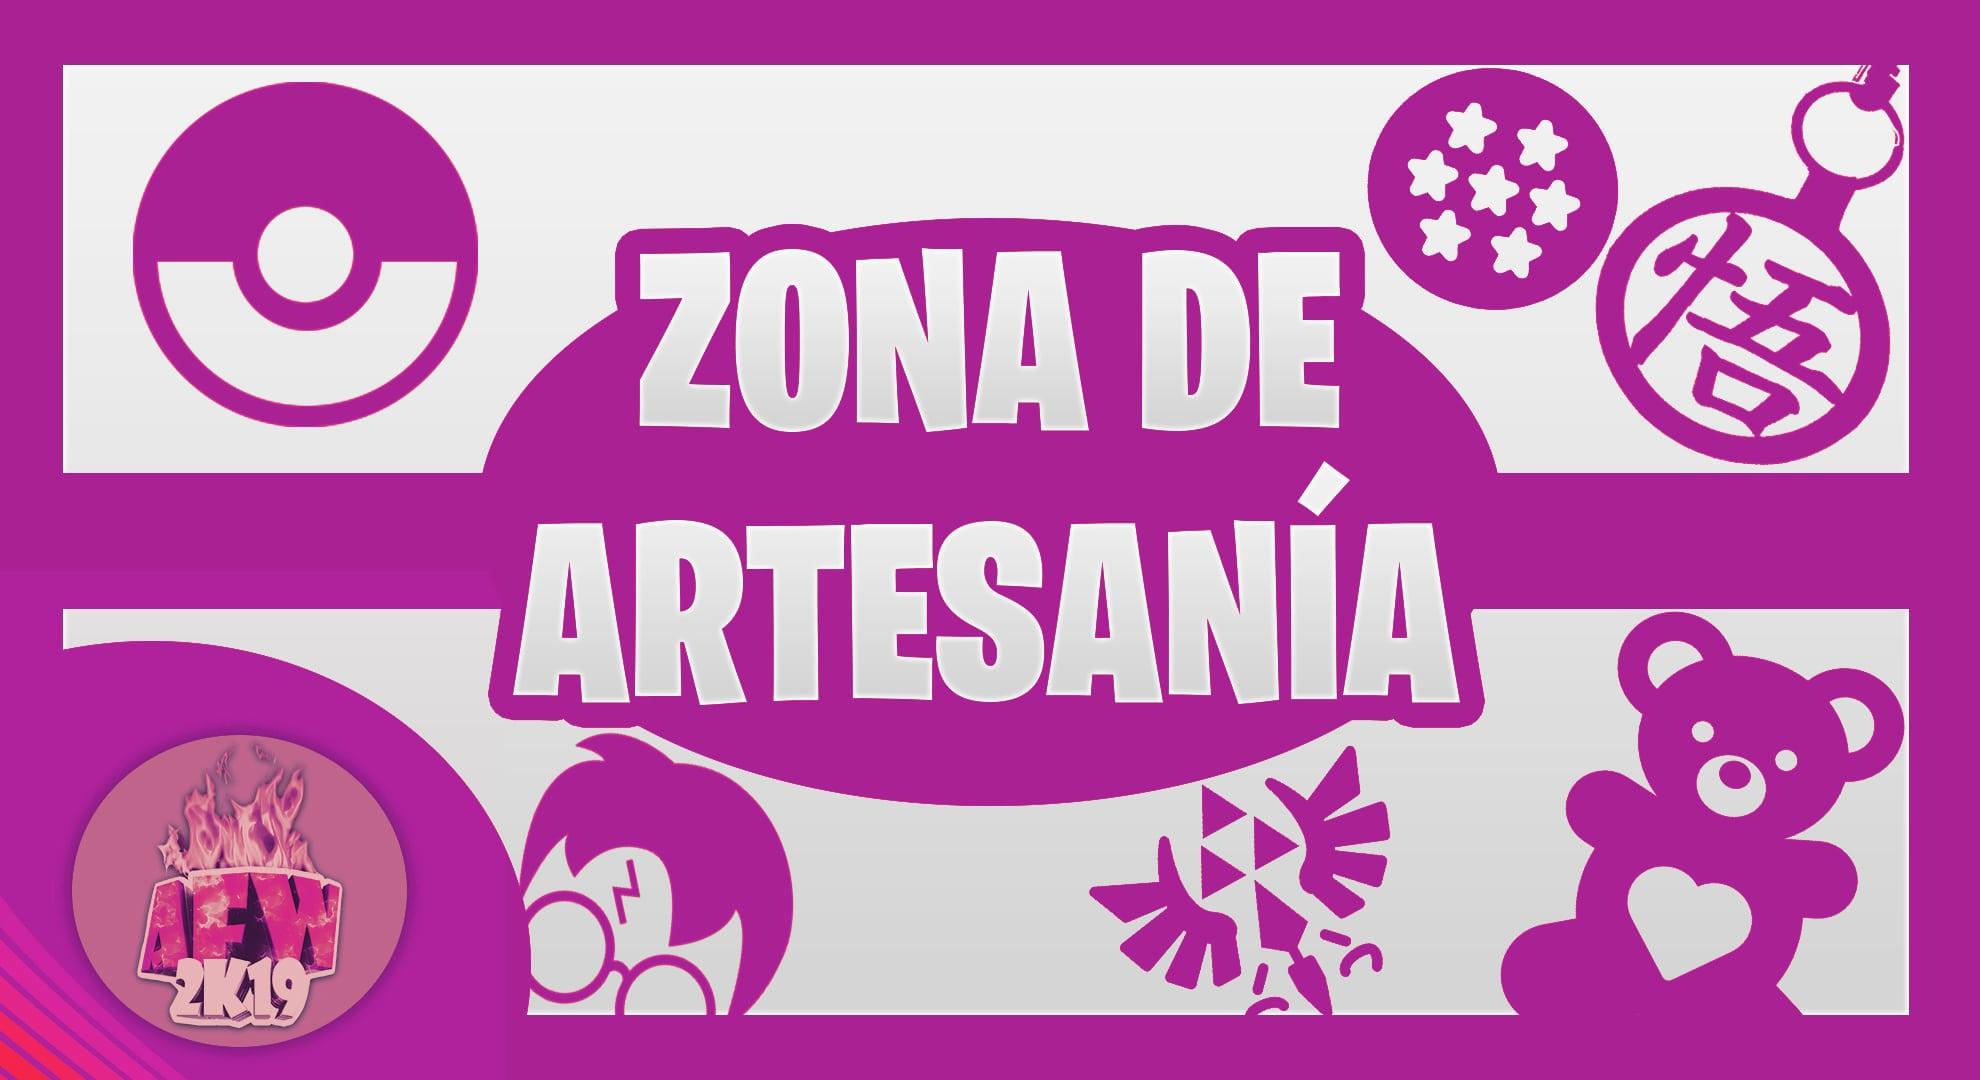 zona de artesania